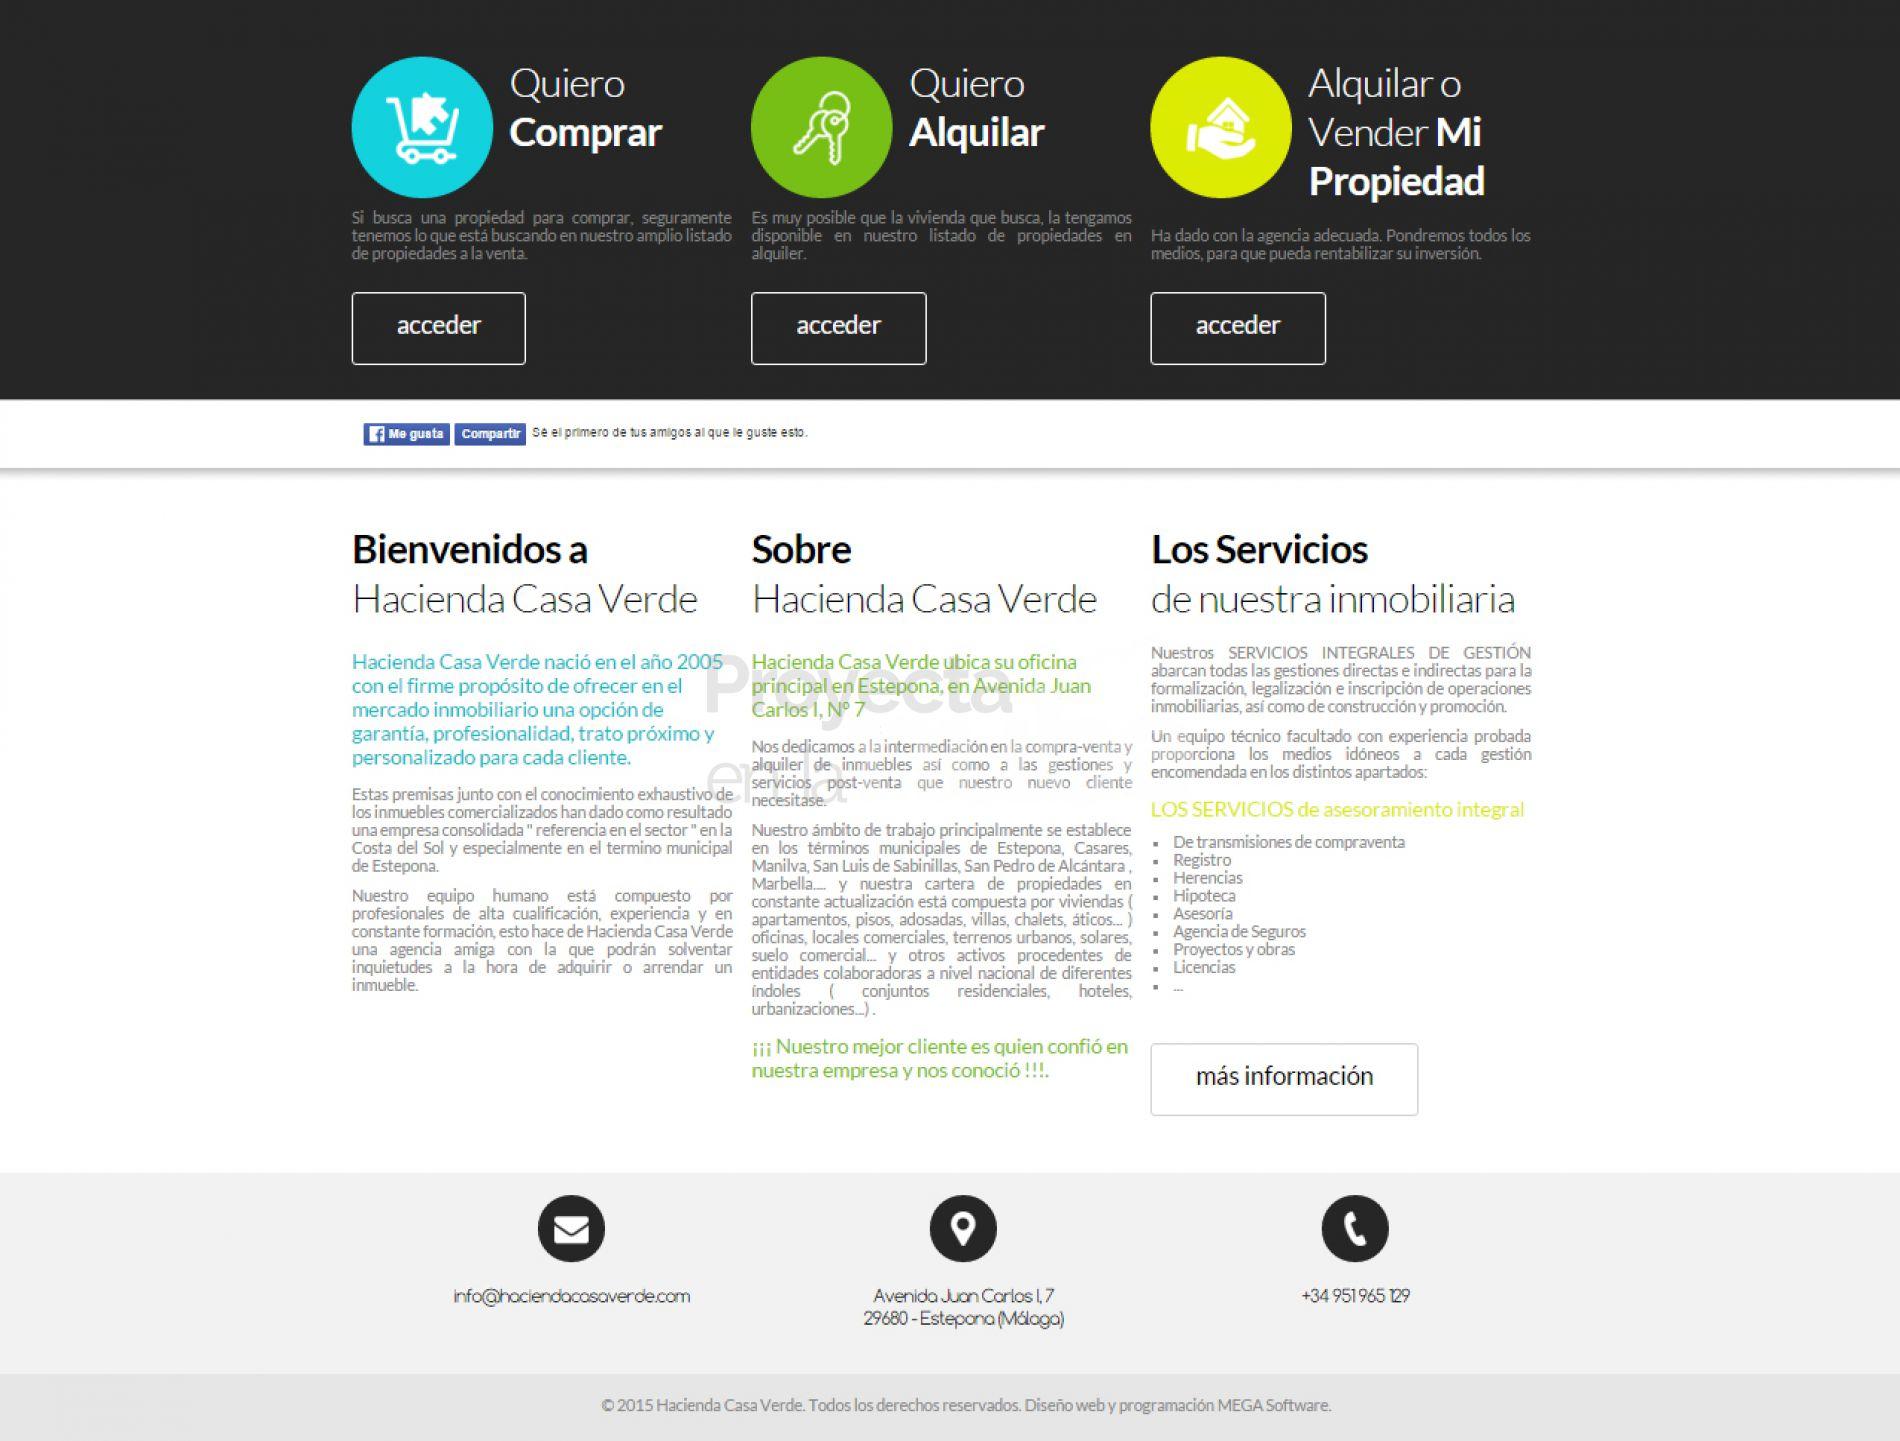 P gina web estepona inmobiliaria hacienda casa verde for Inmobiliaria o inmobiliaria